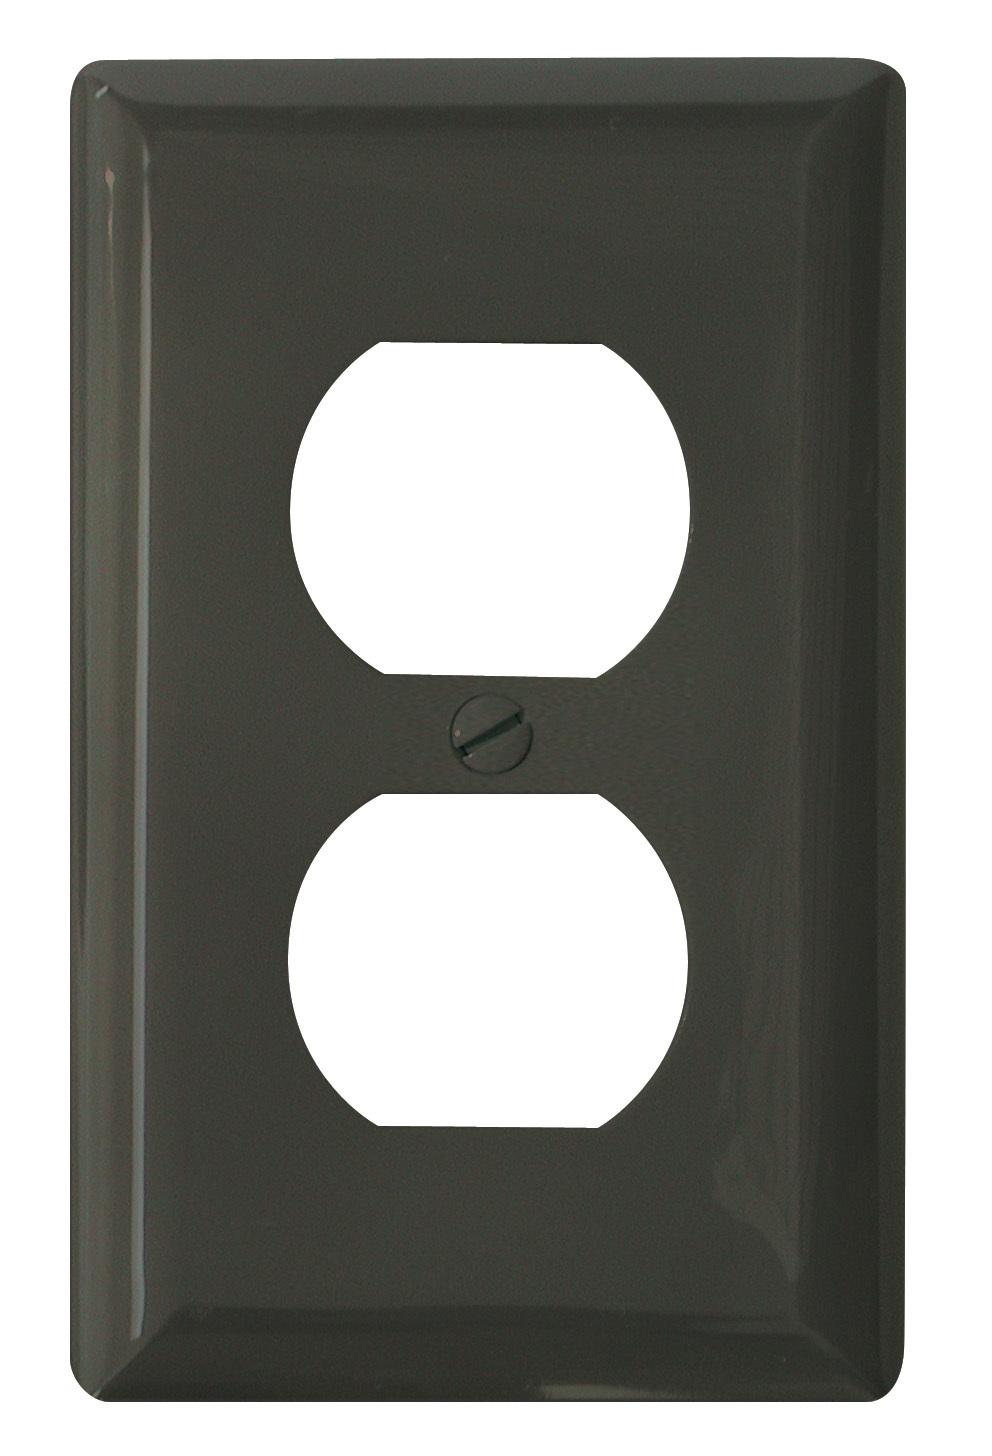 Standard Receptacle Cover - Brown 4132B